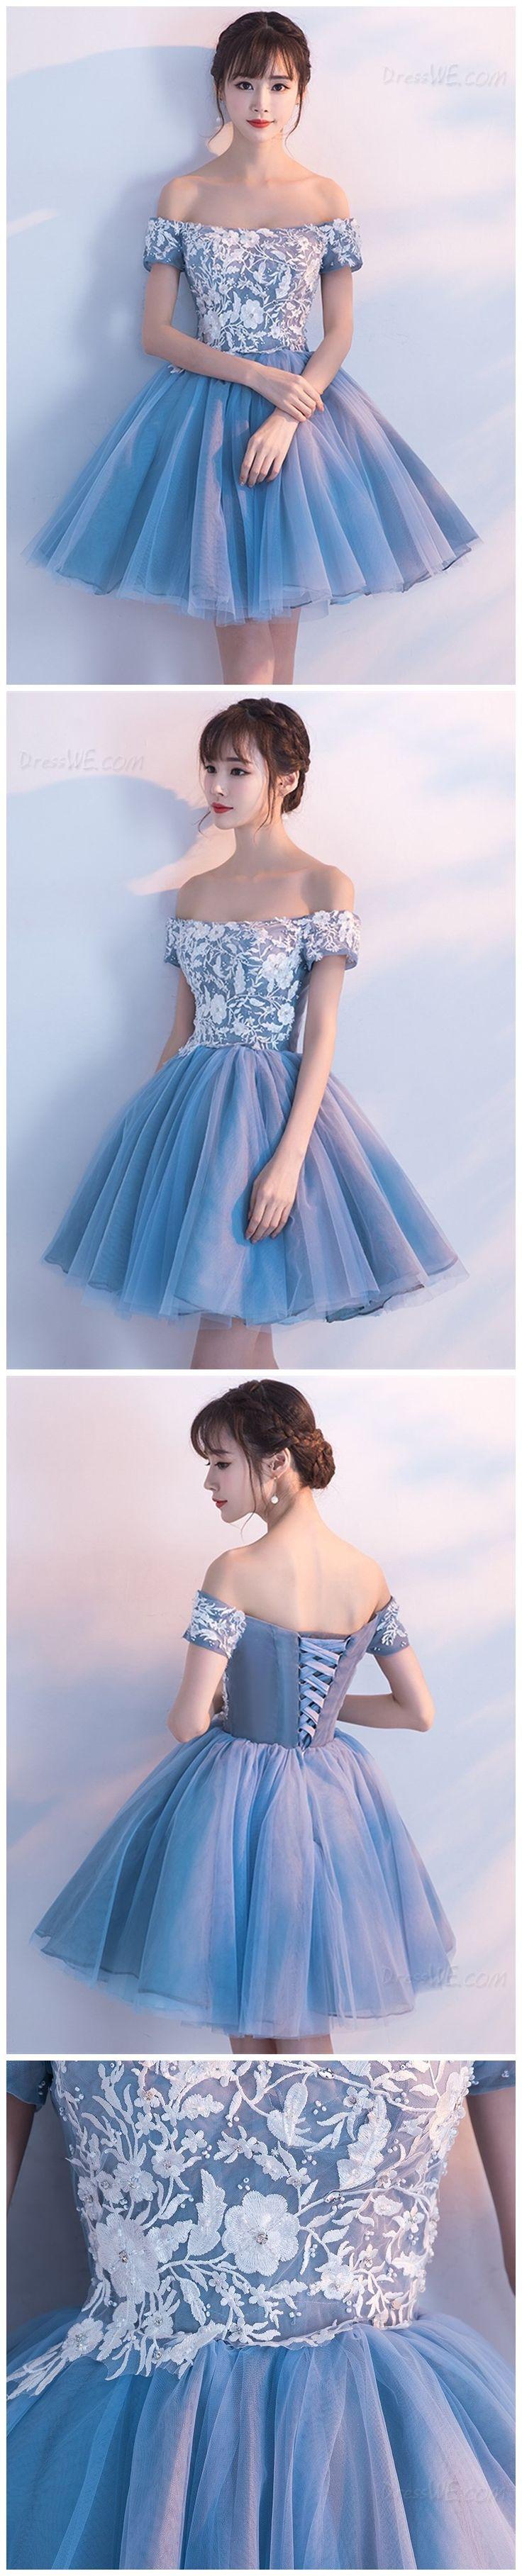 A-line Princess Off-the-shoulder Appliqued Homecoming Dresses APD2658a appliqued homecoming dress, sleeveless homecoming dress, graduation dress.